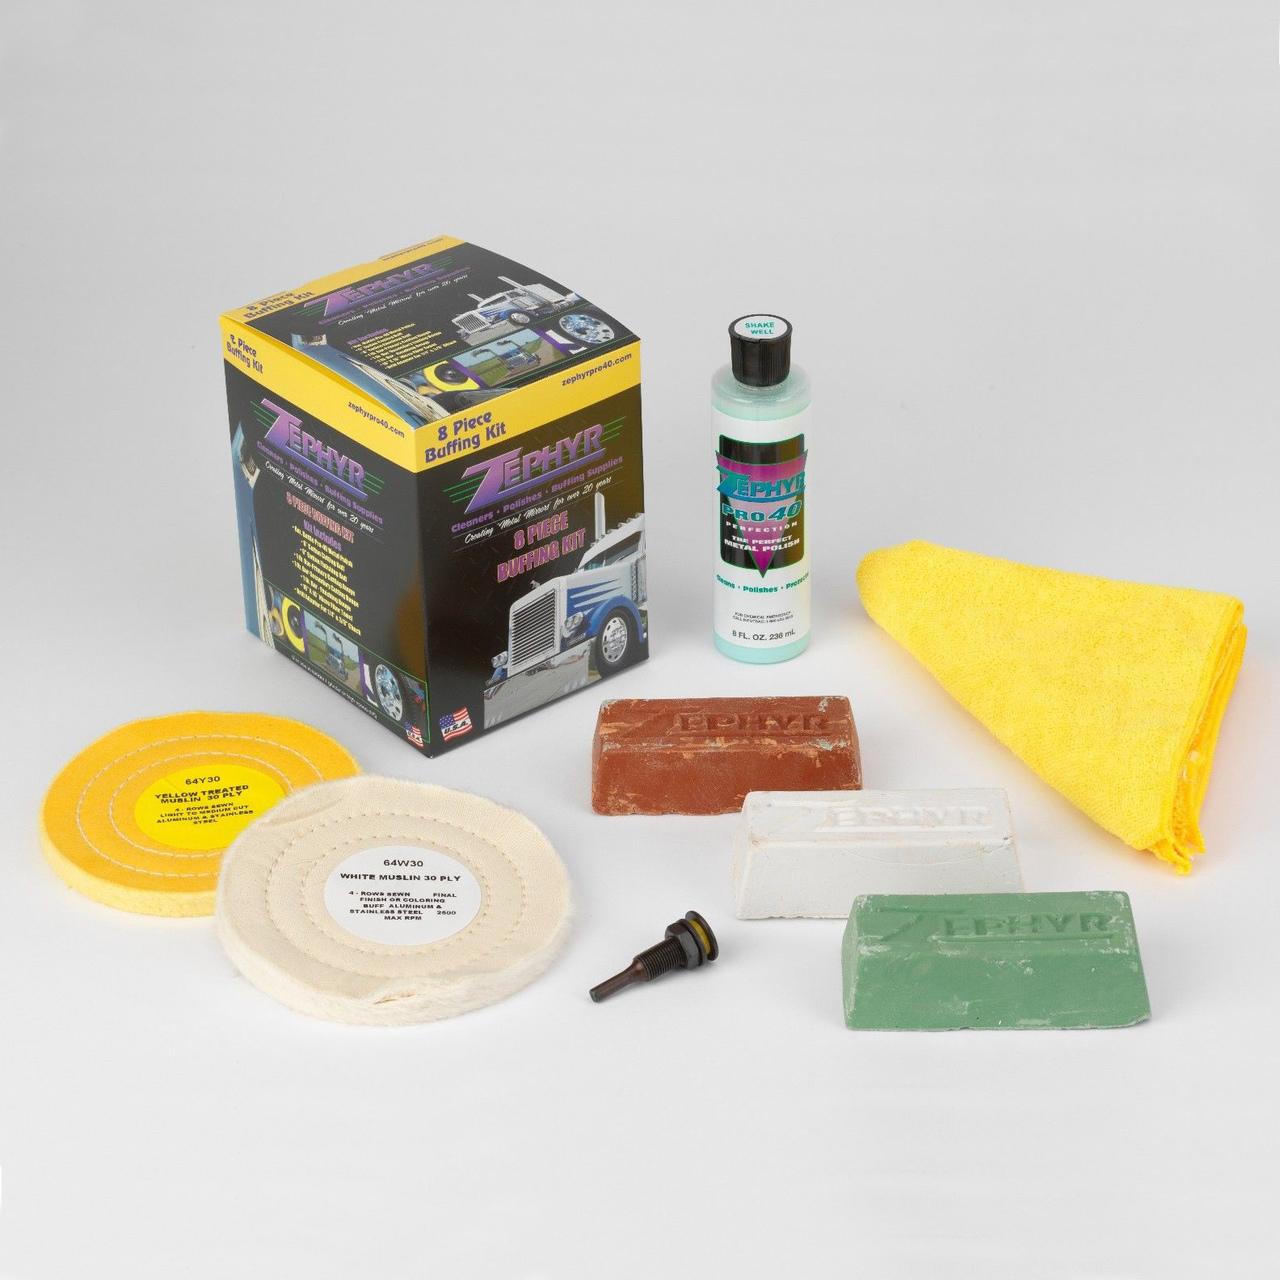 Zephyr (8 Piece) Buffing Kit